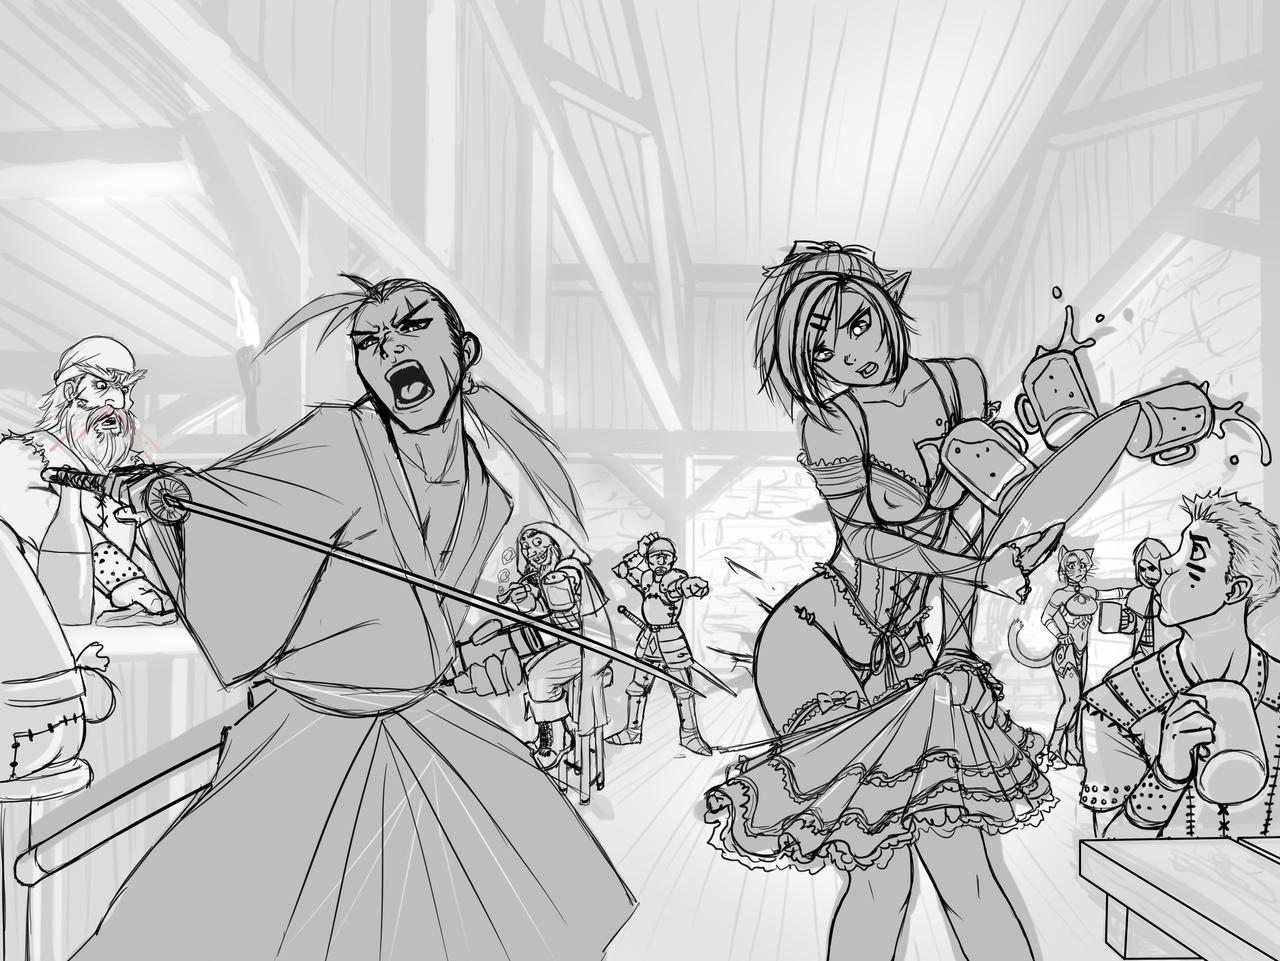 Tavern Shenanigans - Sketch by RoninDude